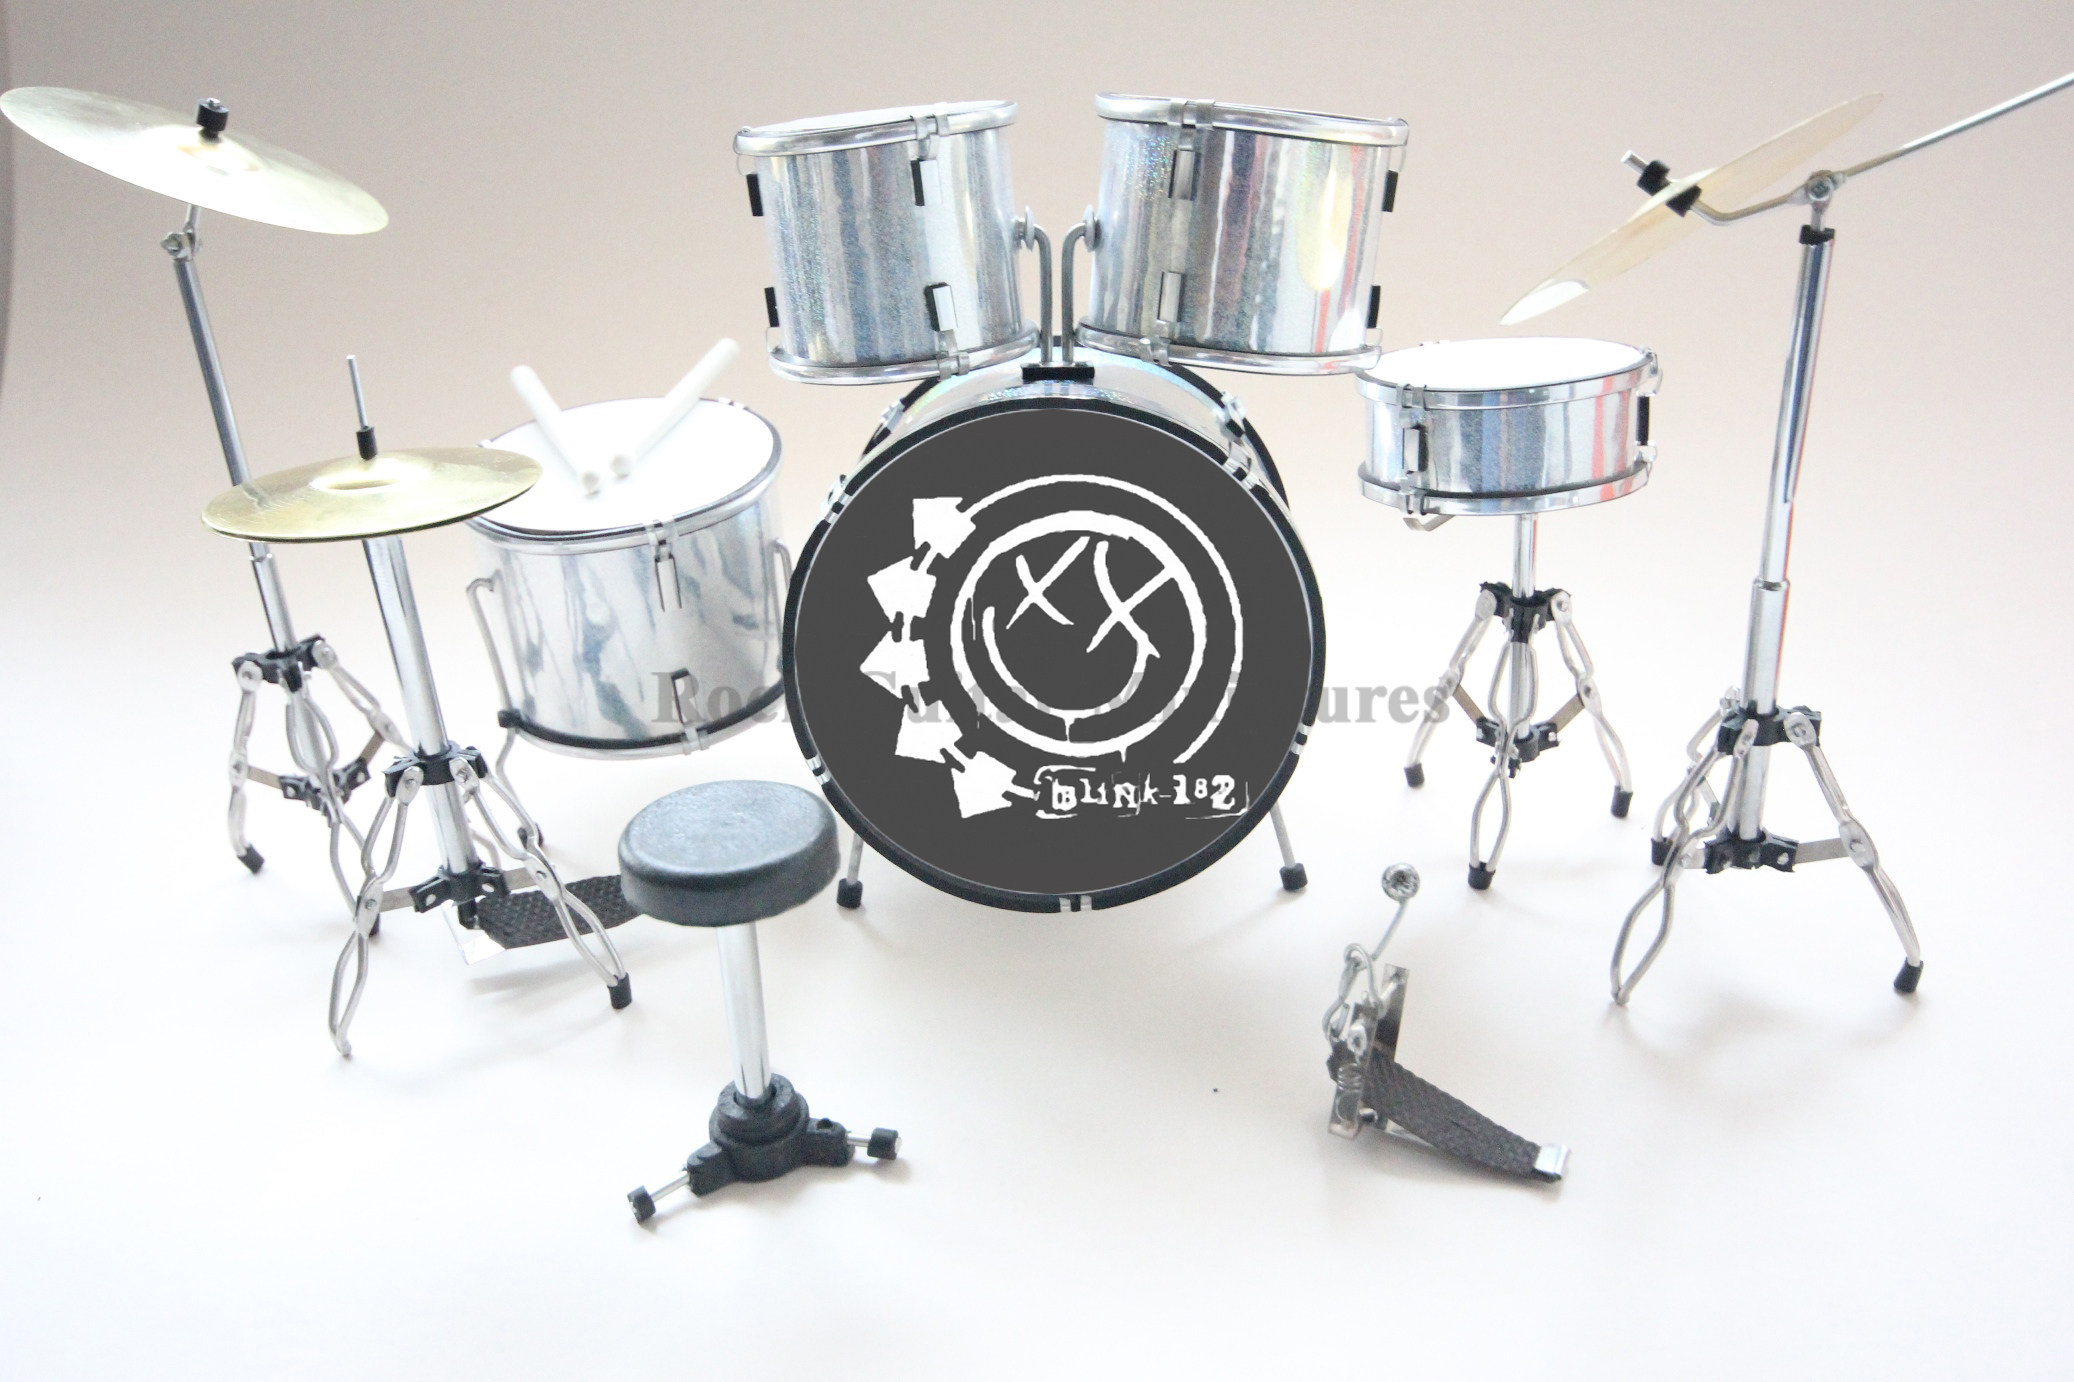 Travis Barker Blink 182 Miniature Drum kit (RGM386)